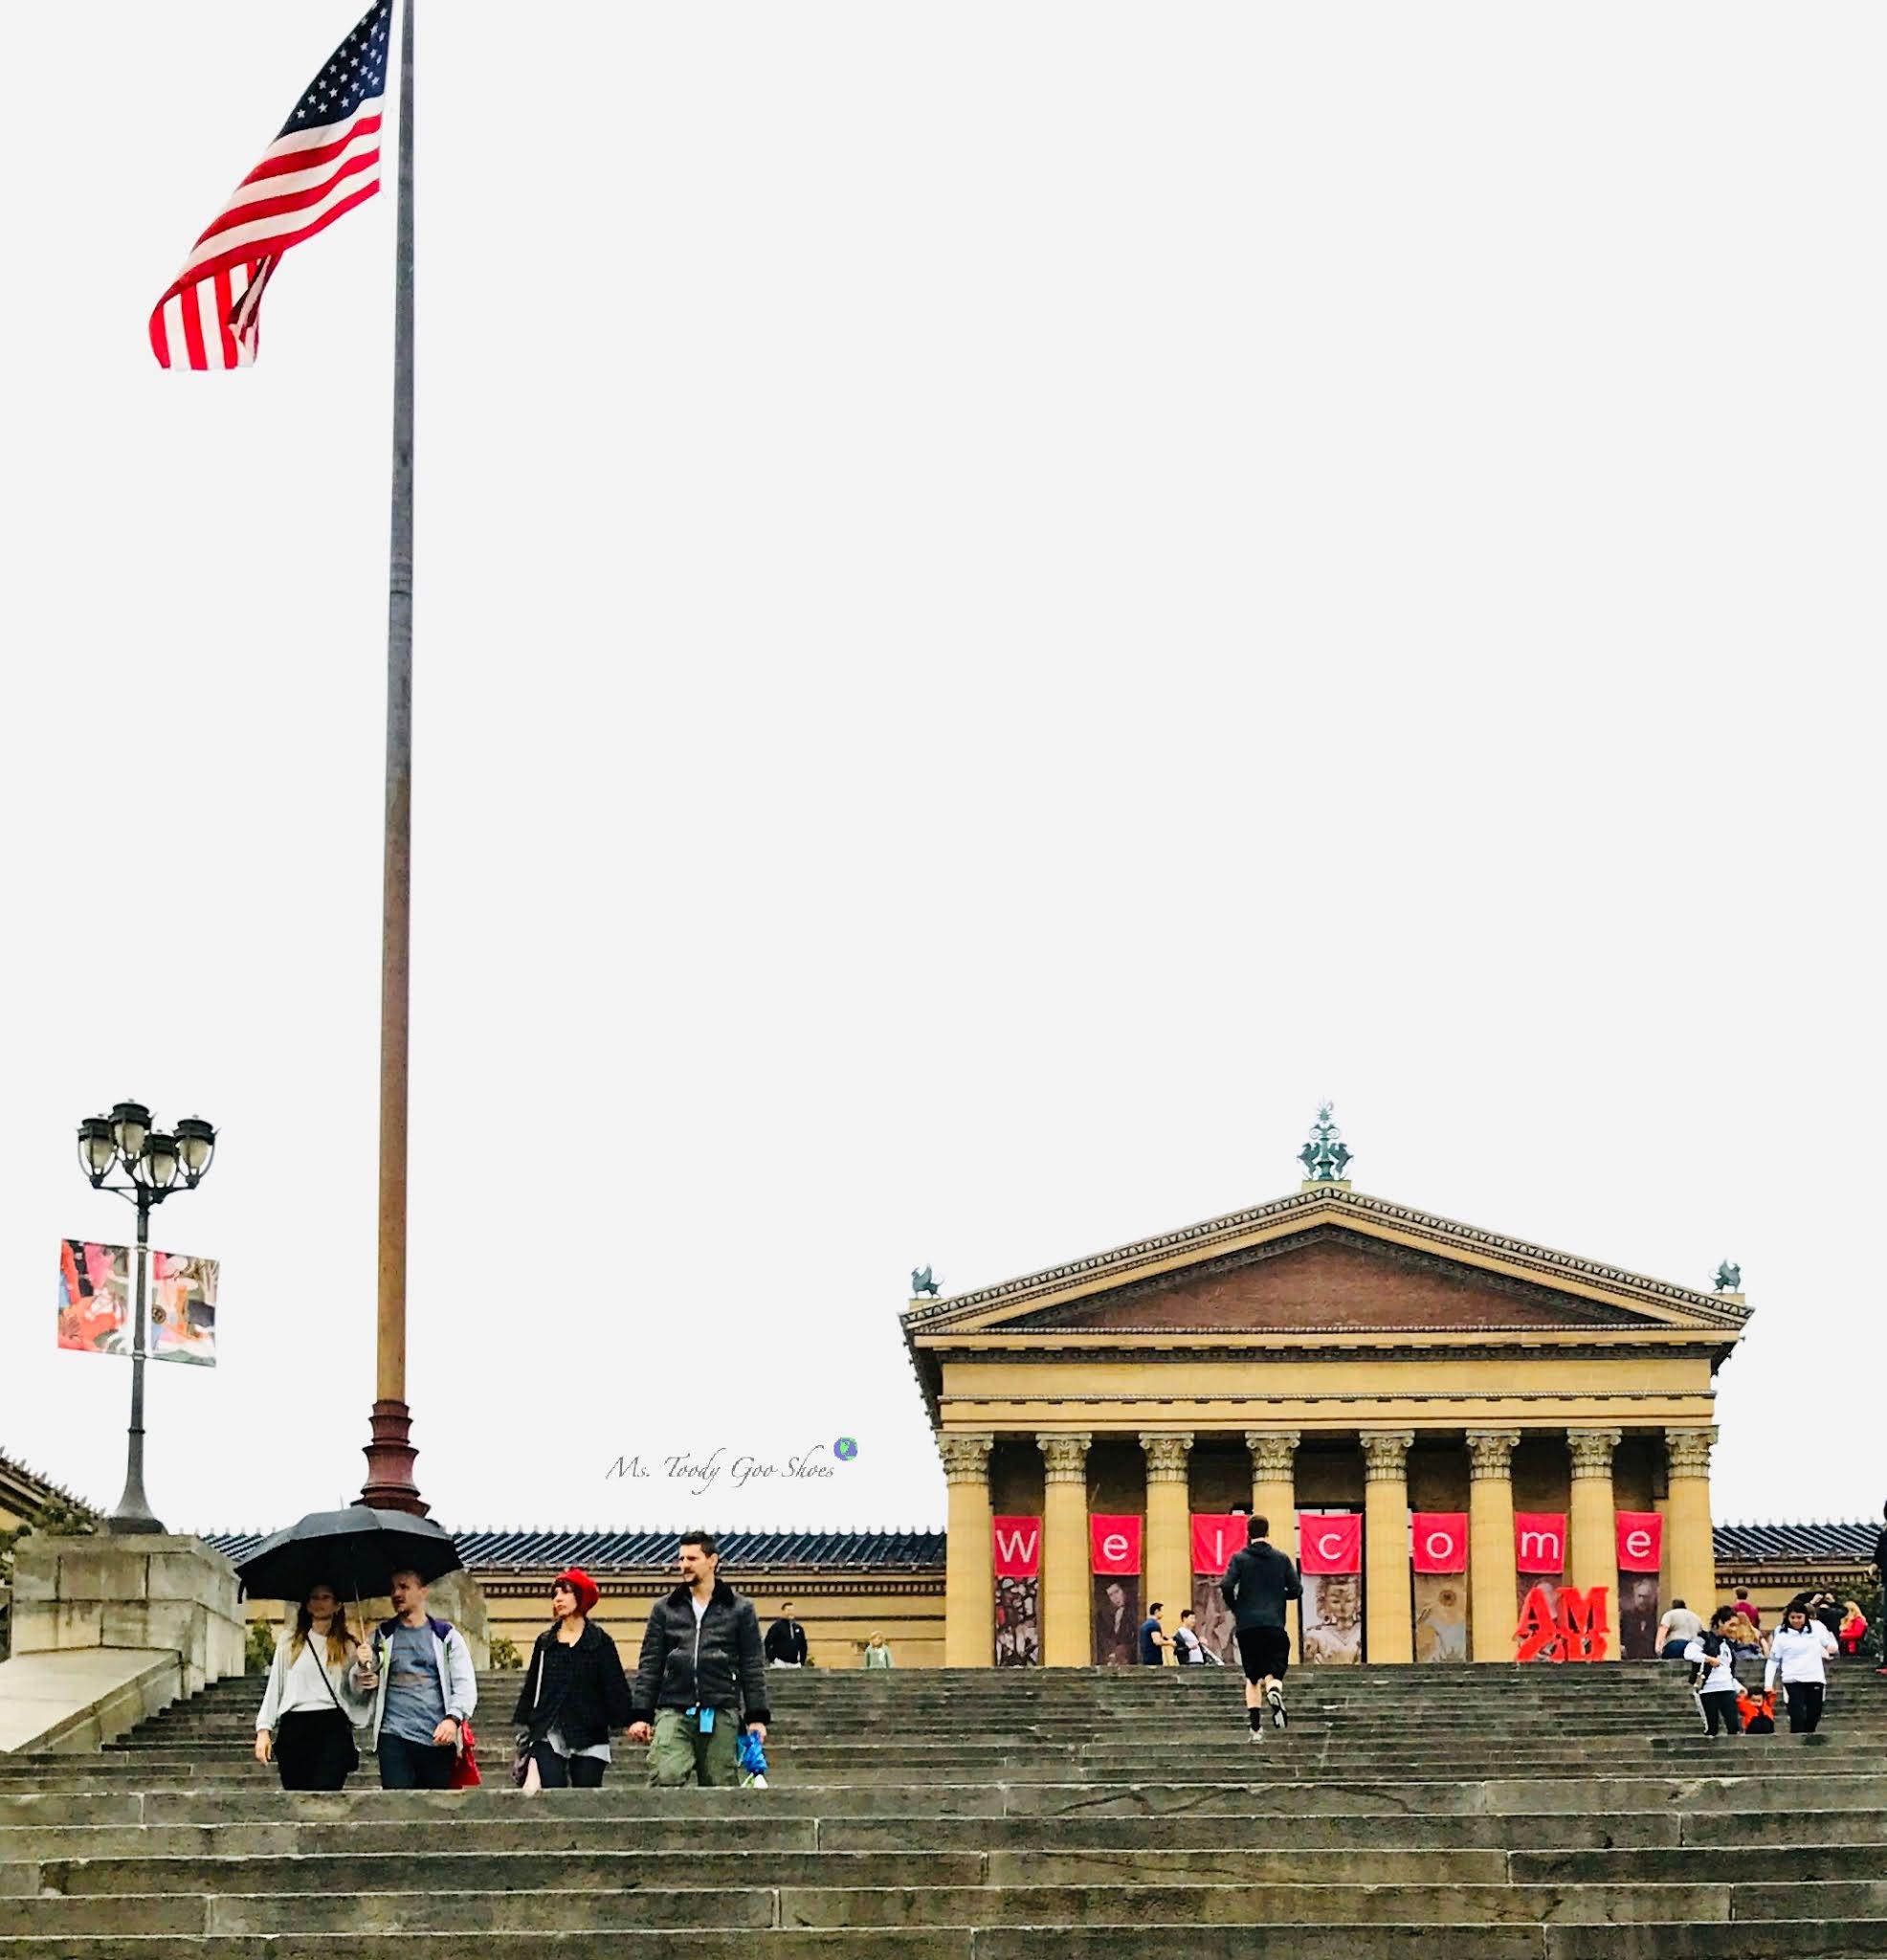 American Flags, Philadelfphia, PA | Ms. Toody Goo Shoes